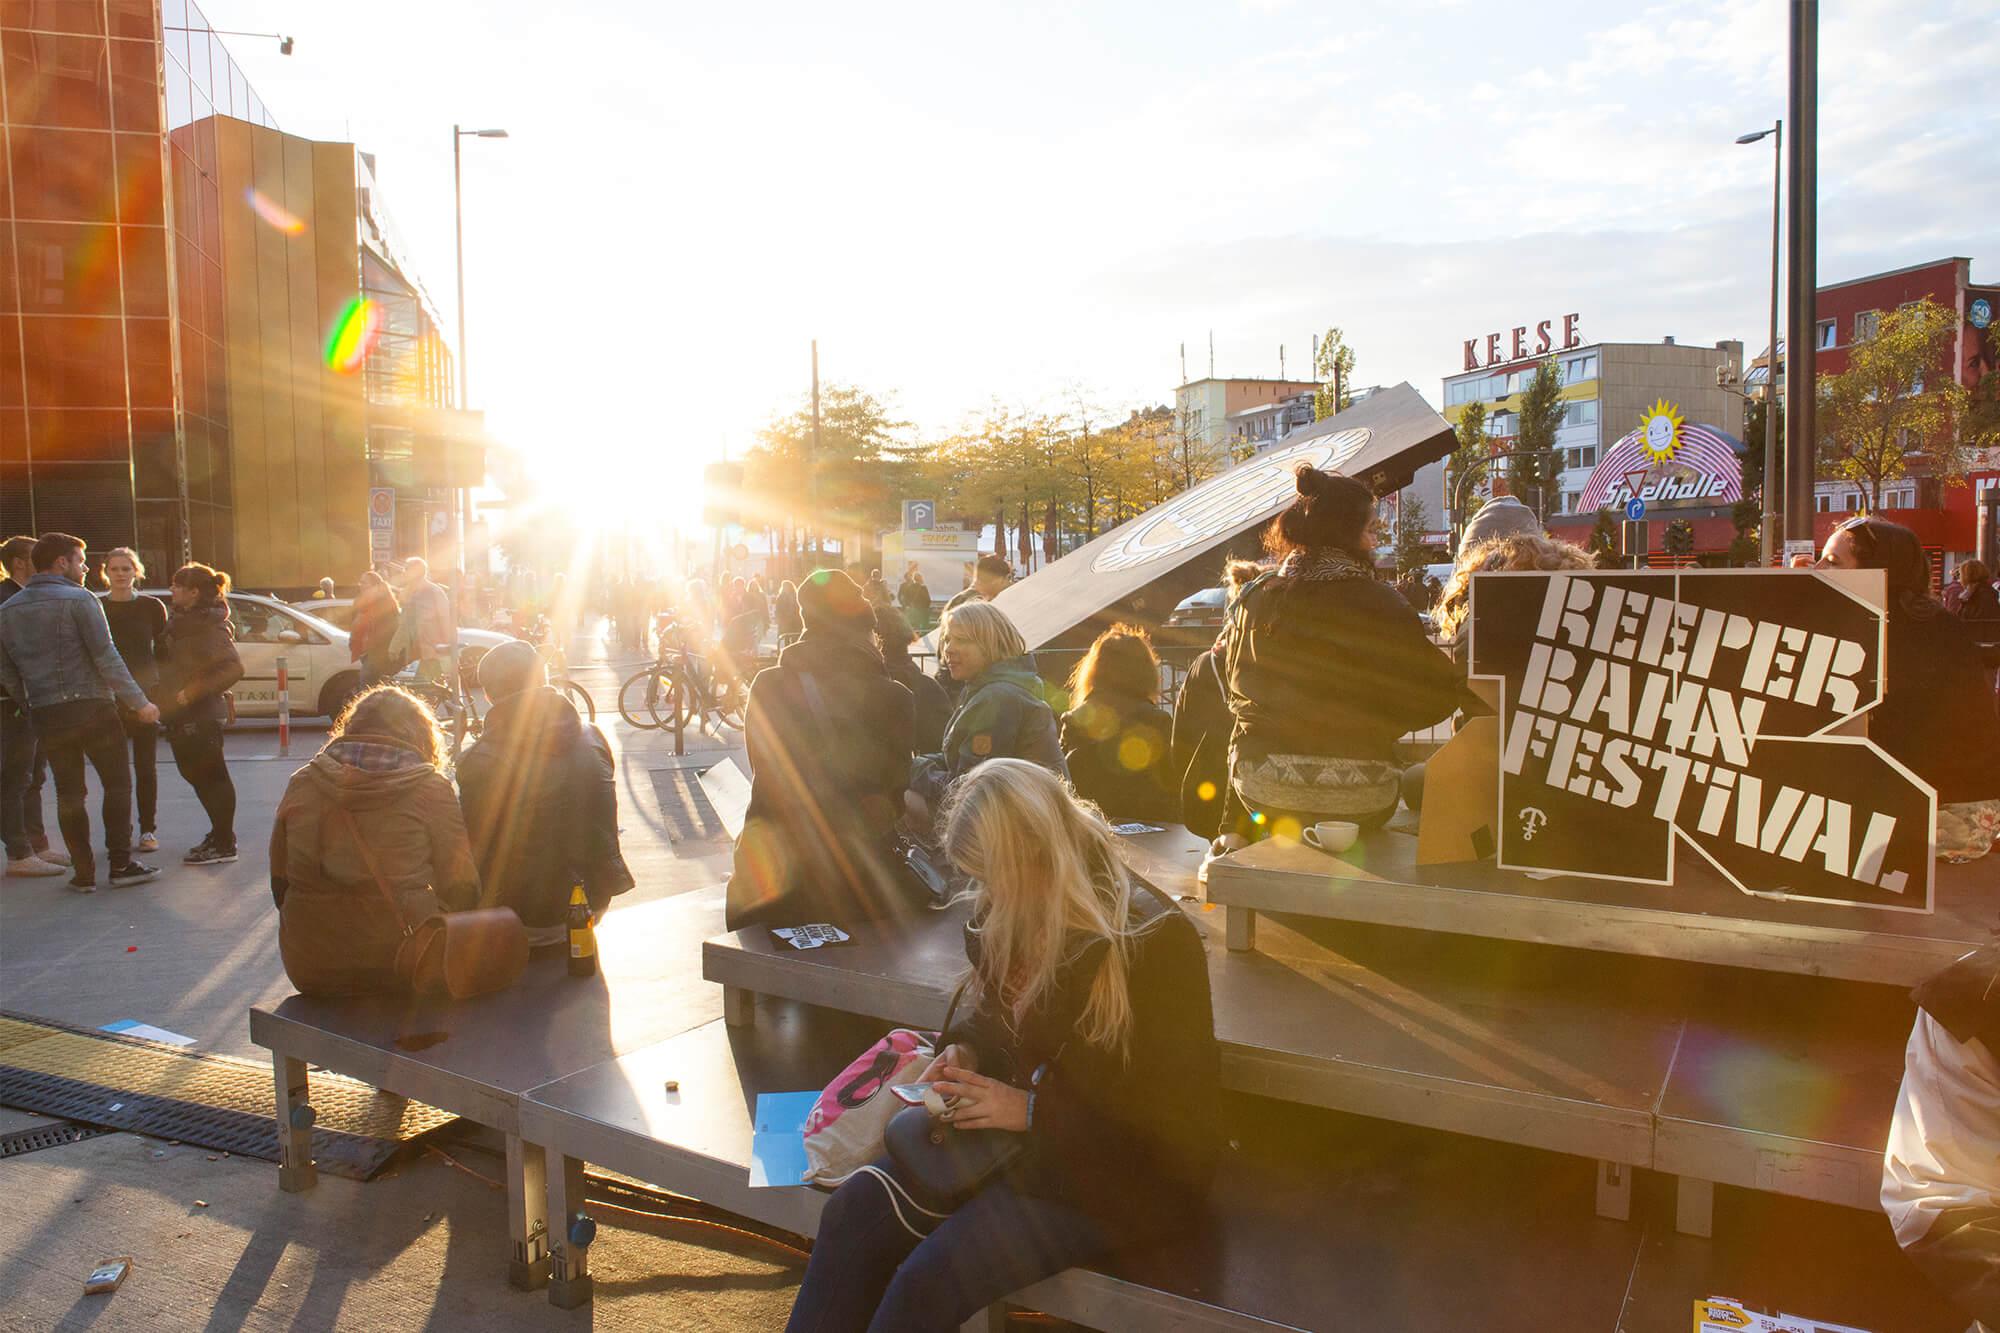 Reeperbahn Festival, Spielbudenplatz4_Lisa Meinen